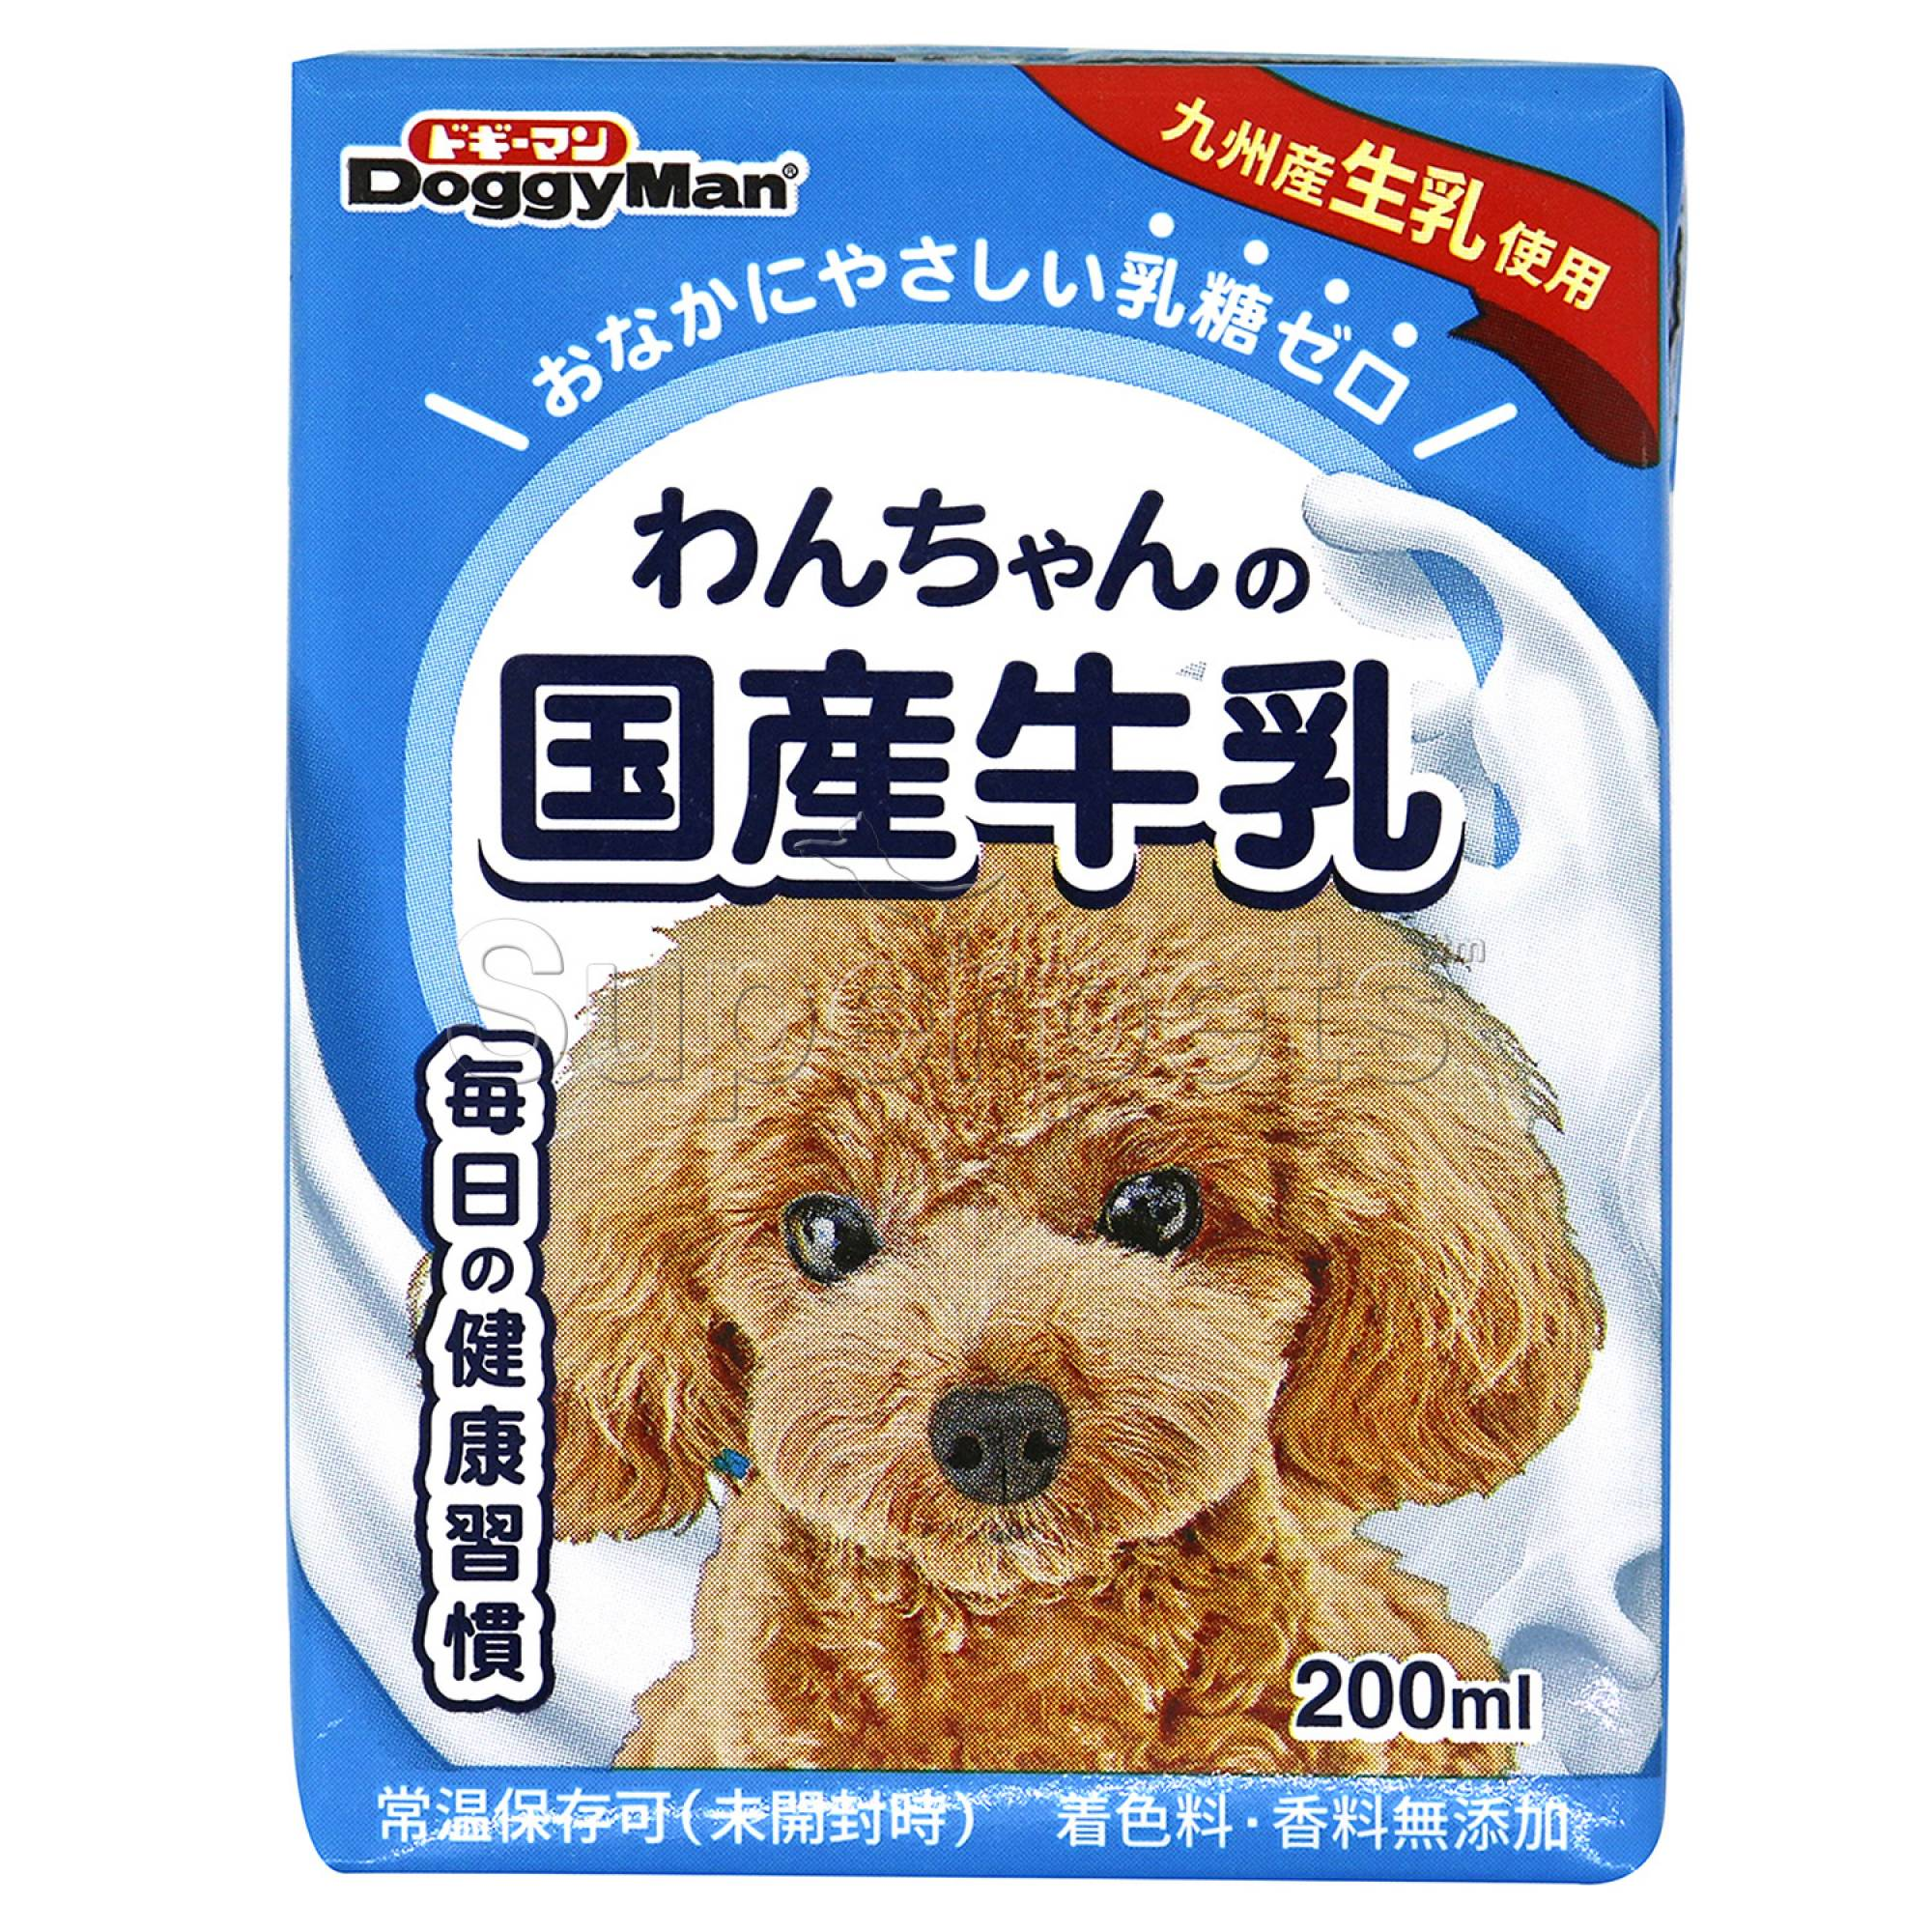 DoggyMan - DM5217 Milk for Dog 200ml